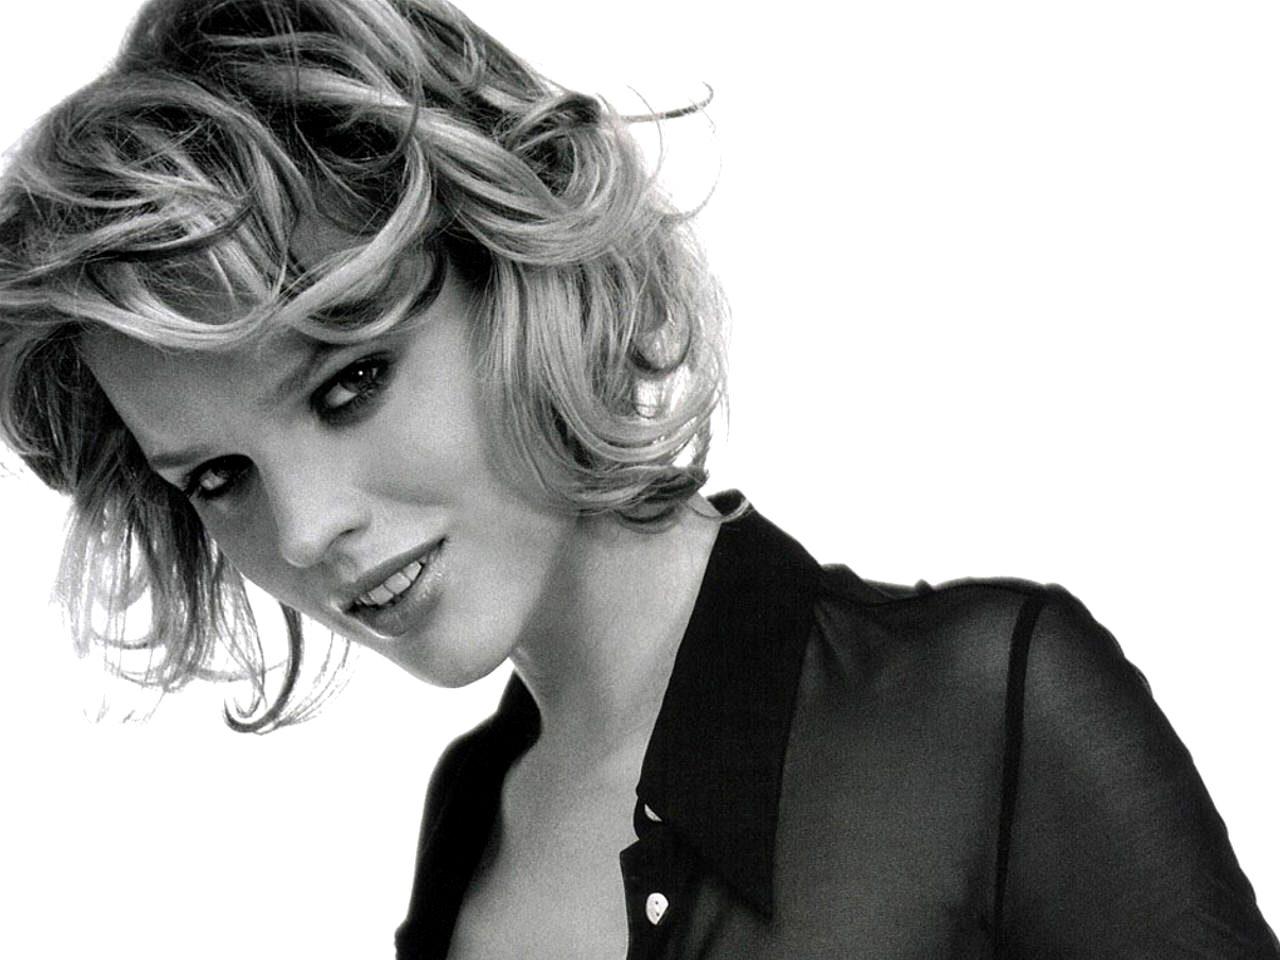 http://3.bp.blogspot.com/-rIX-V5A22Do/UKmhhm-tp4I/AAAAAAAADBo/QC6ewEGqTek/s1600/2313-celebrity_eva_herzigova_wallpaper.jpg